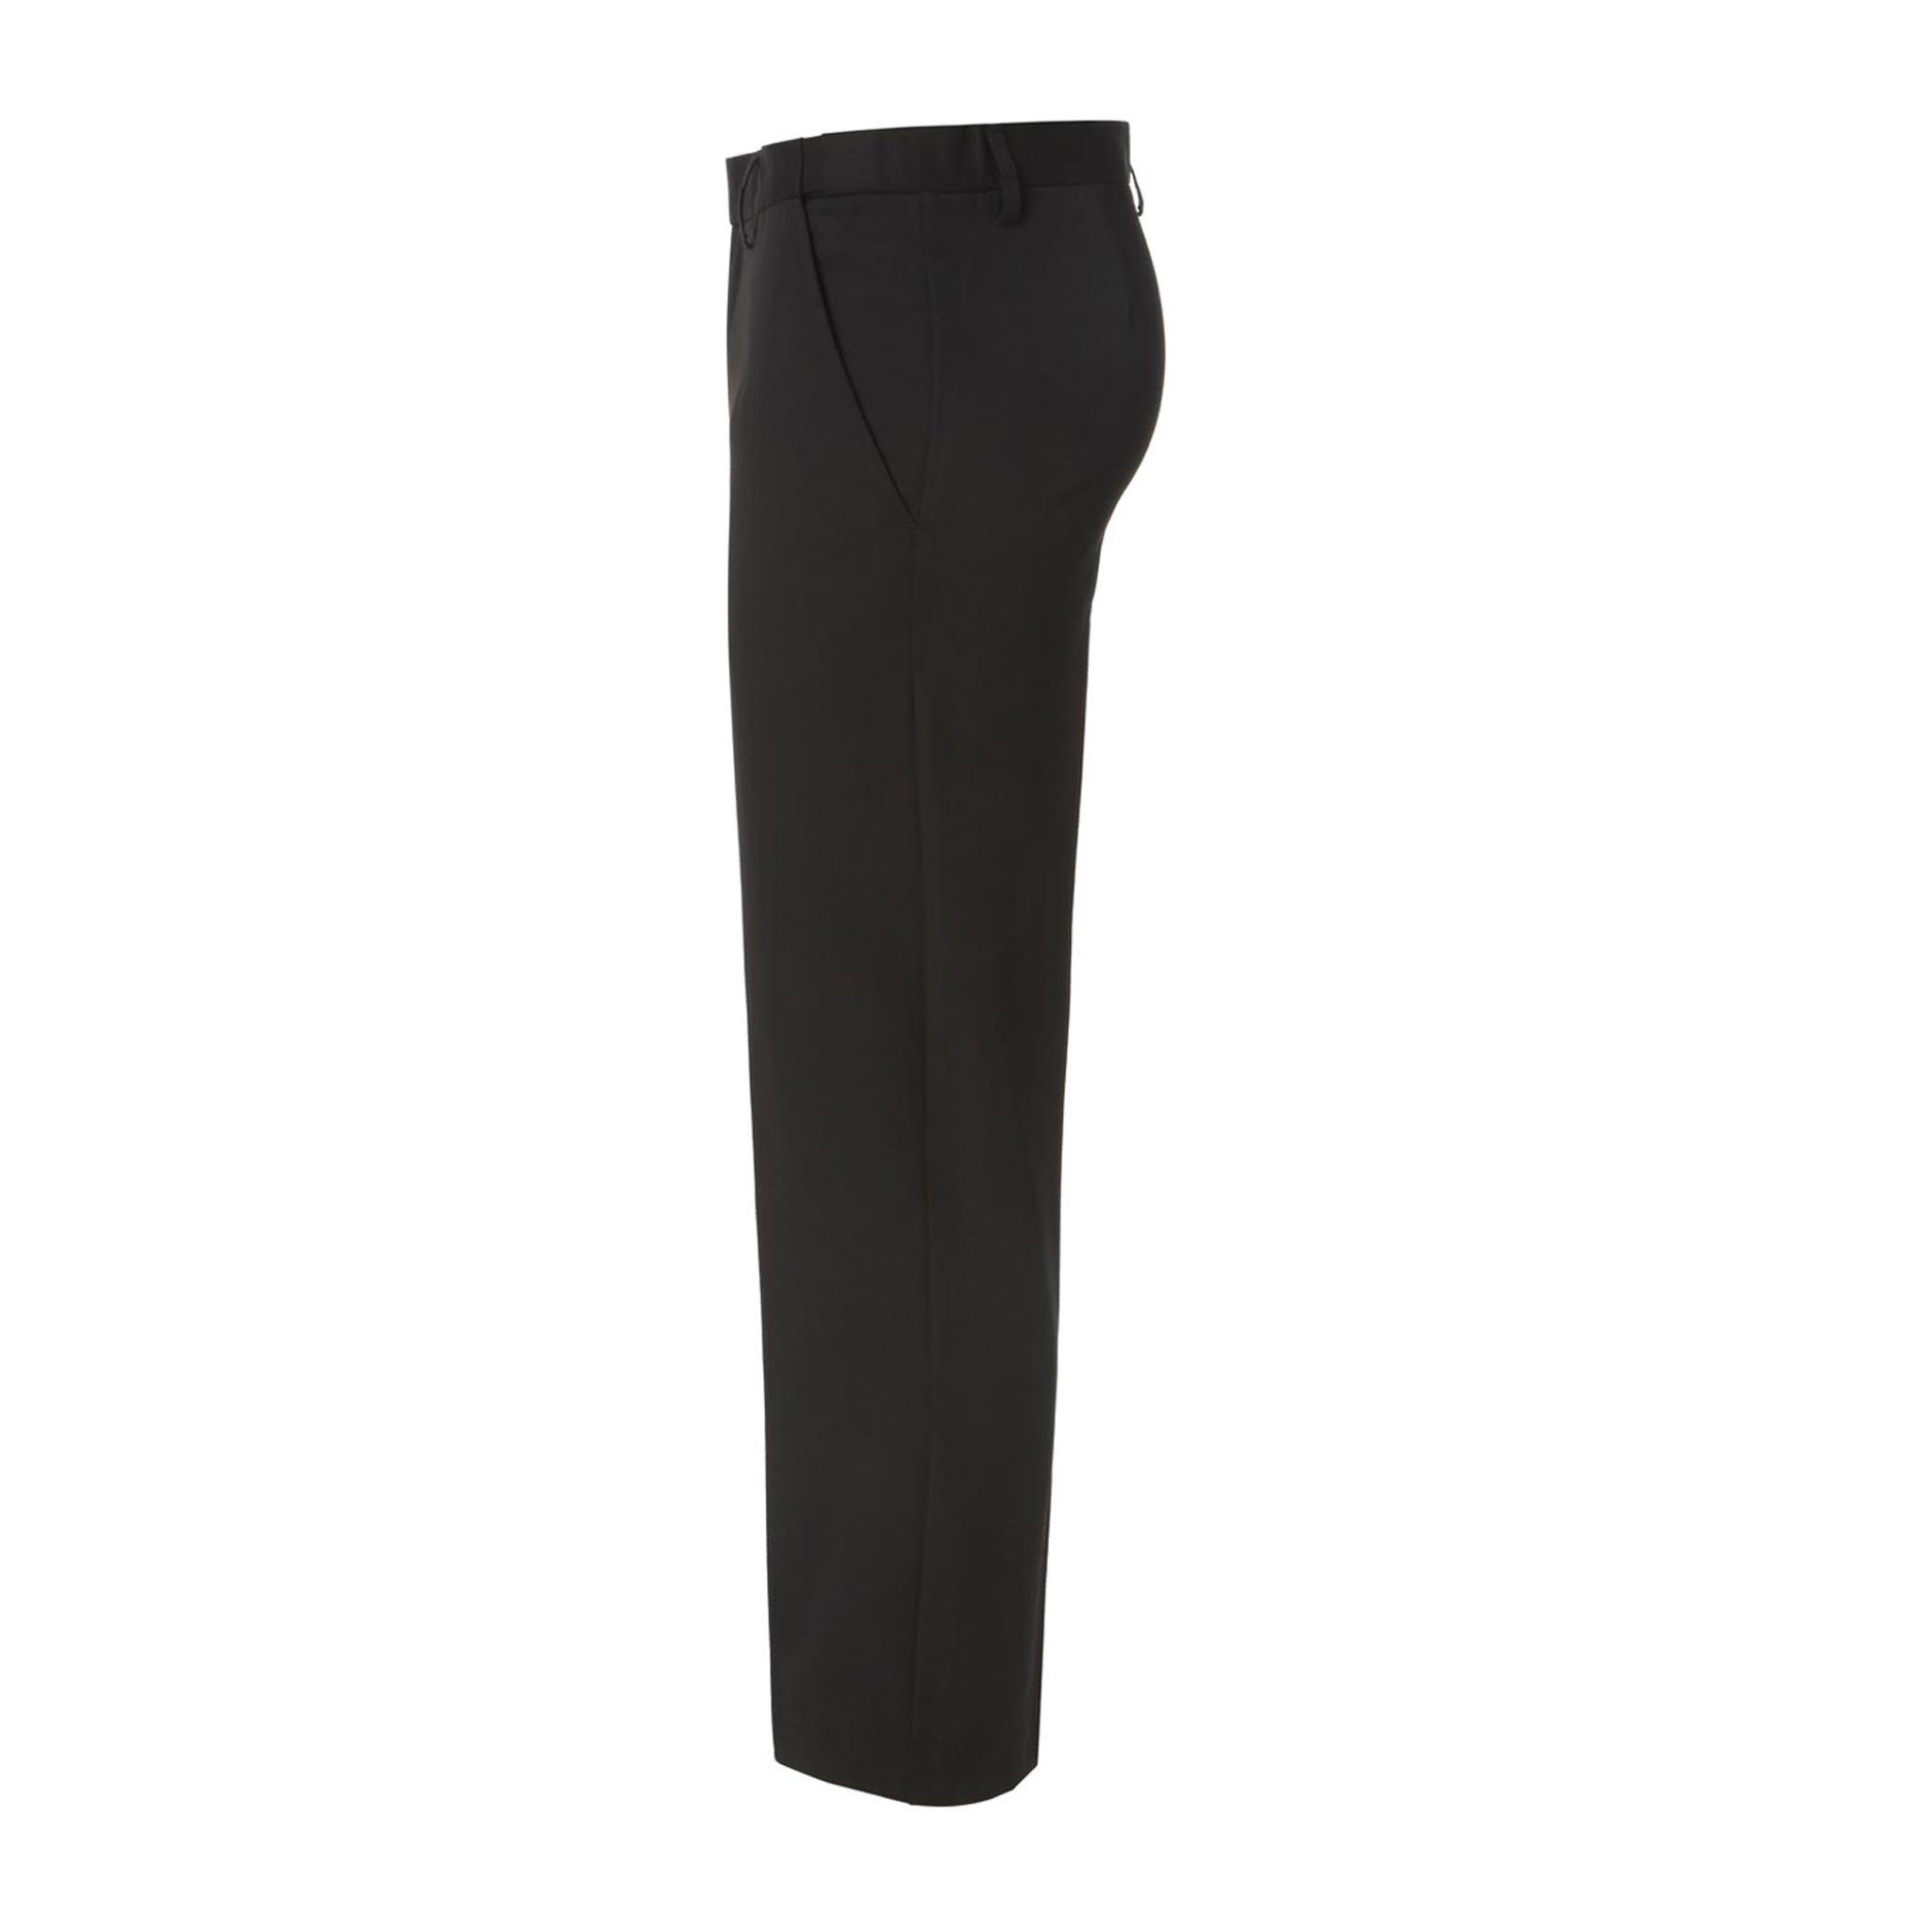 cc91efec6ec Black Plus Size Half elasticated Waist Trousers for Boys